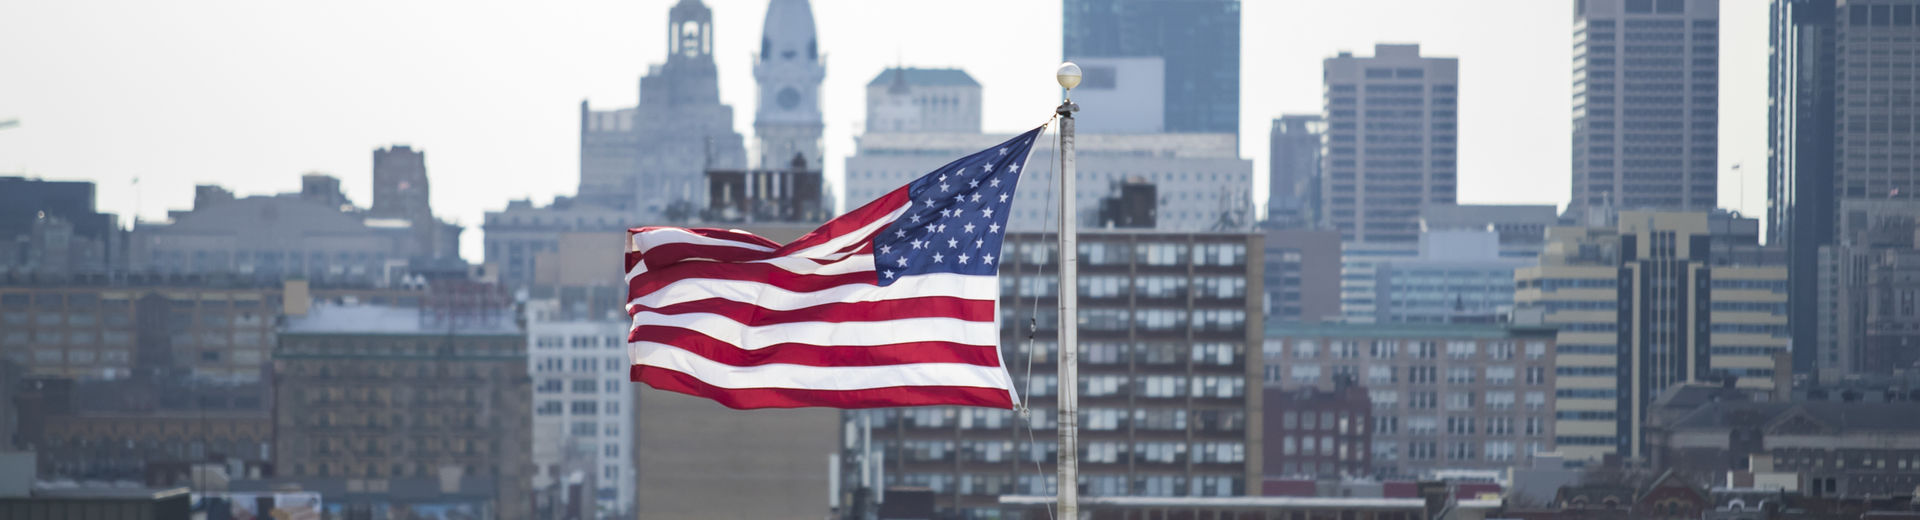 The American flag waves above the Philadelphia city skyline.